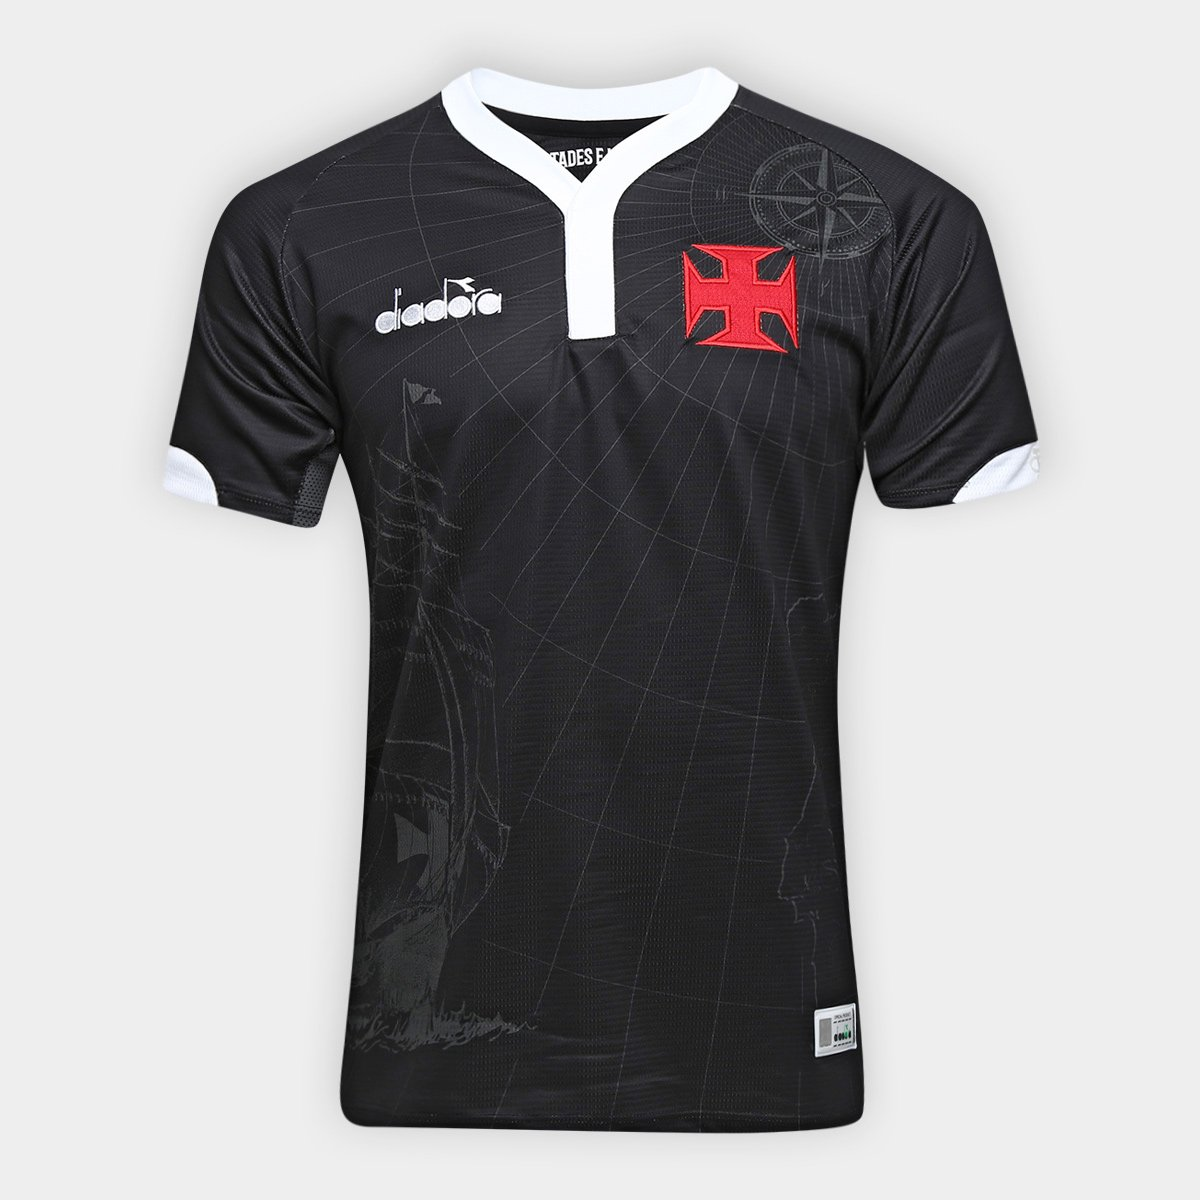 8f581b2c5c2e5 Camisa Vasco III 2018 s n° - Torcedor Diadora Masculina - Preto - Compre  Agora